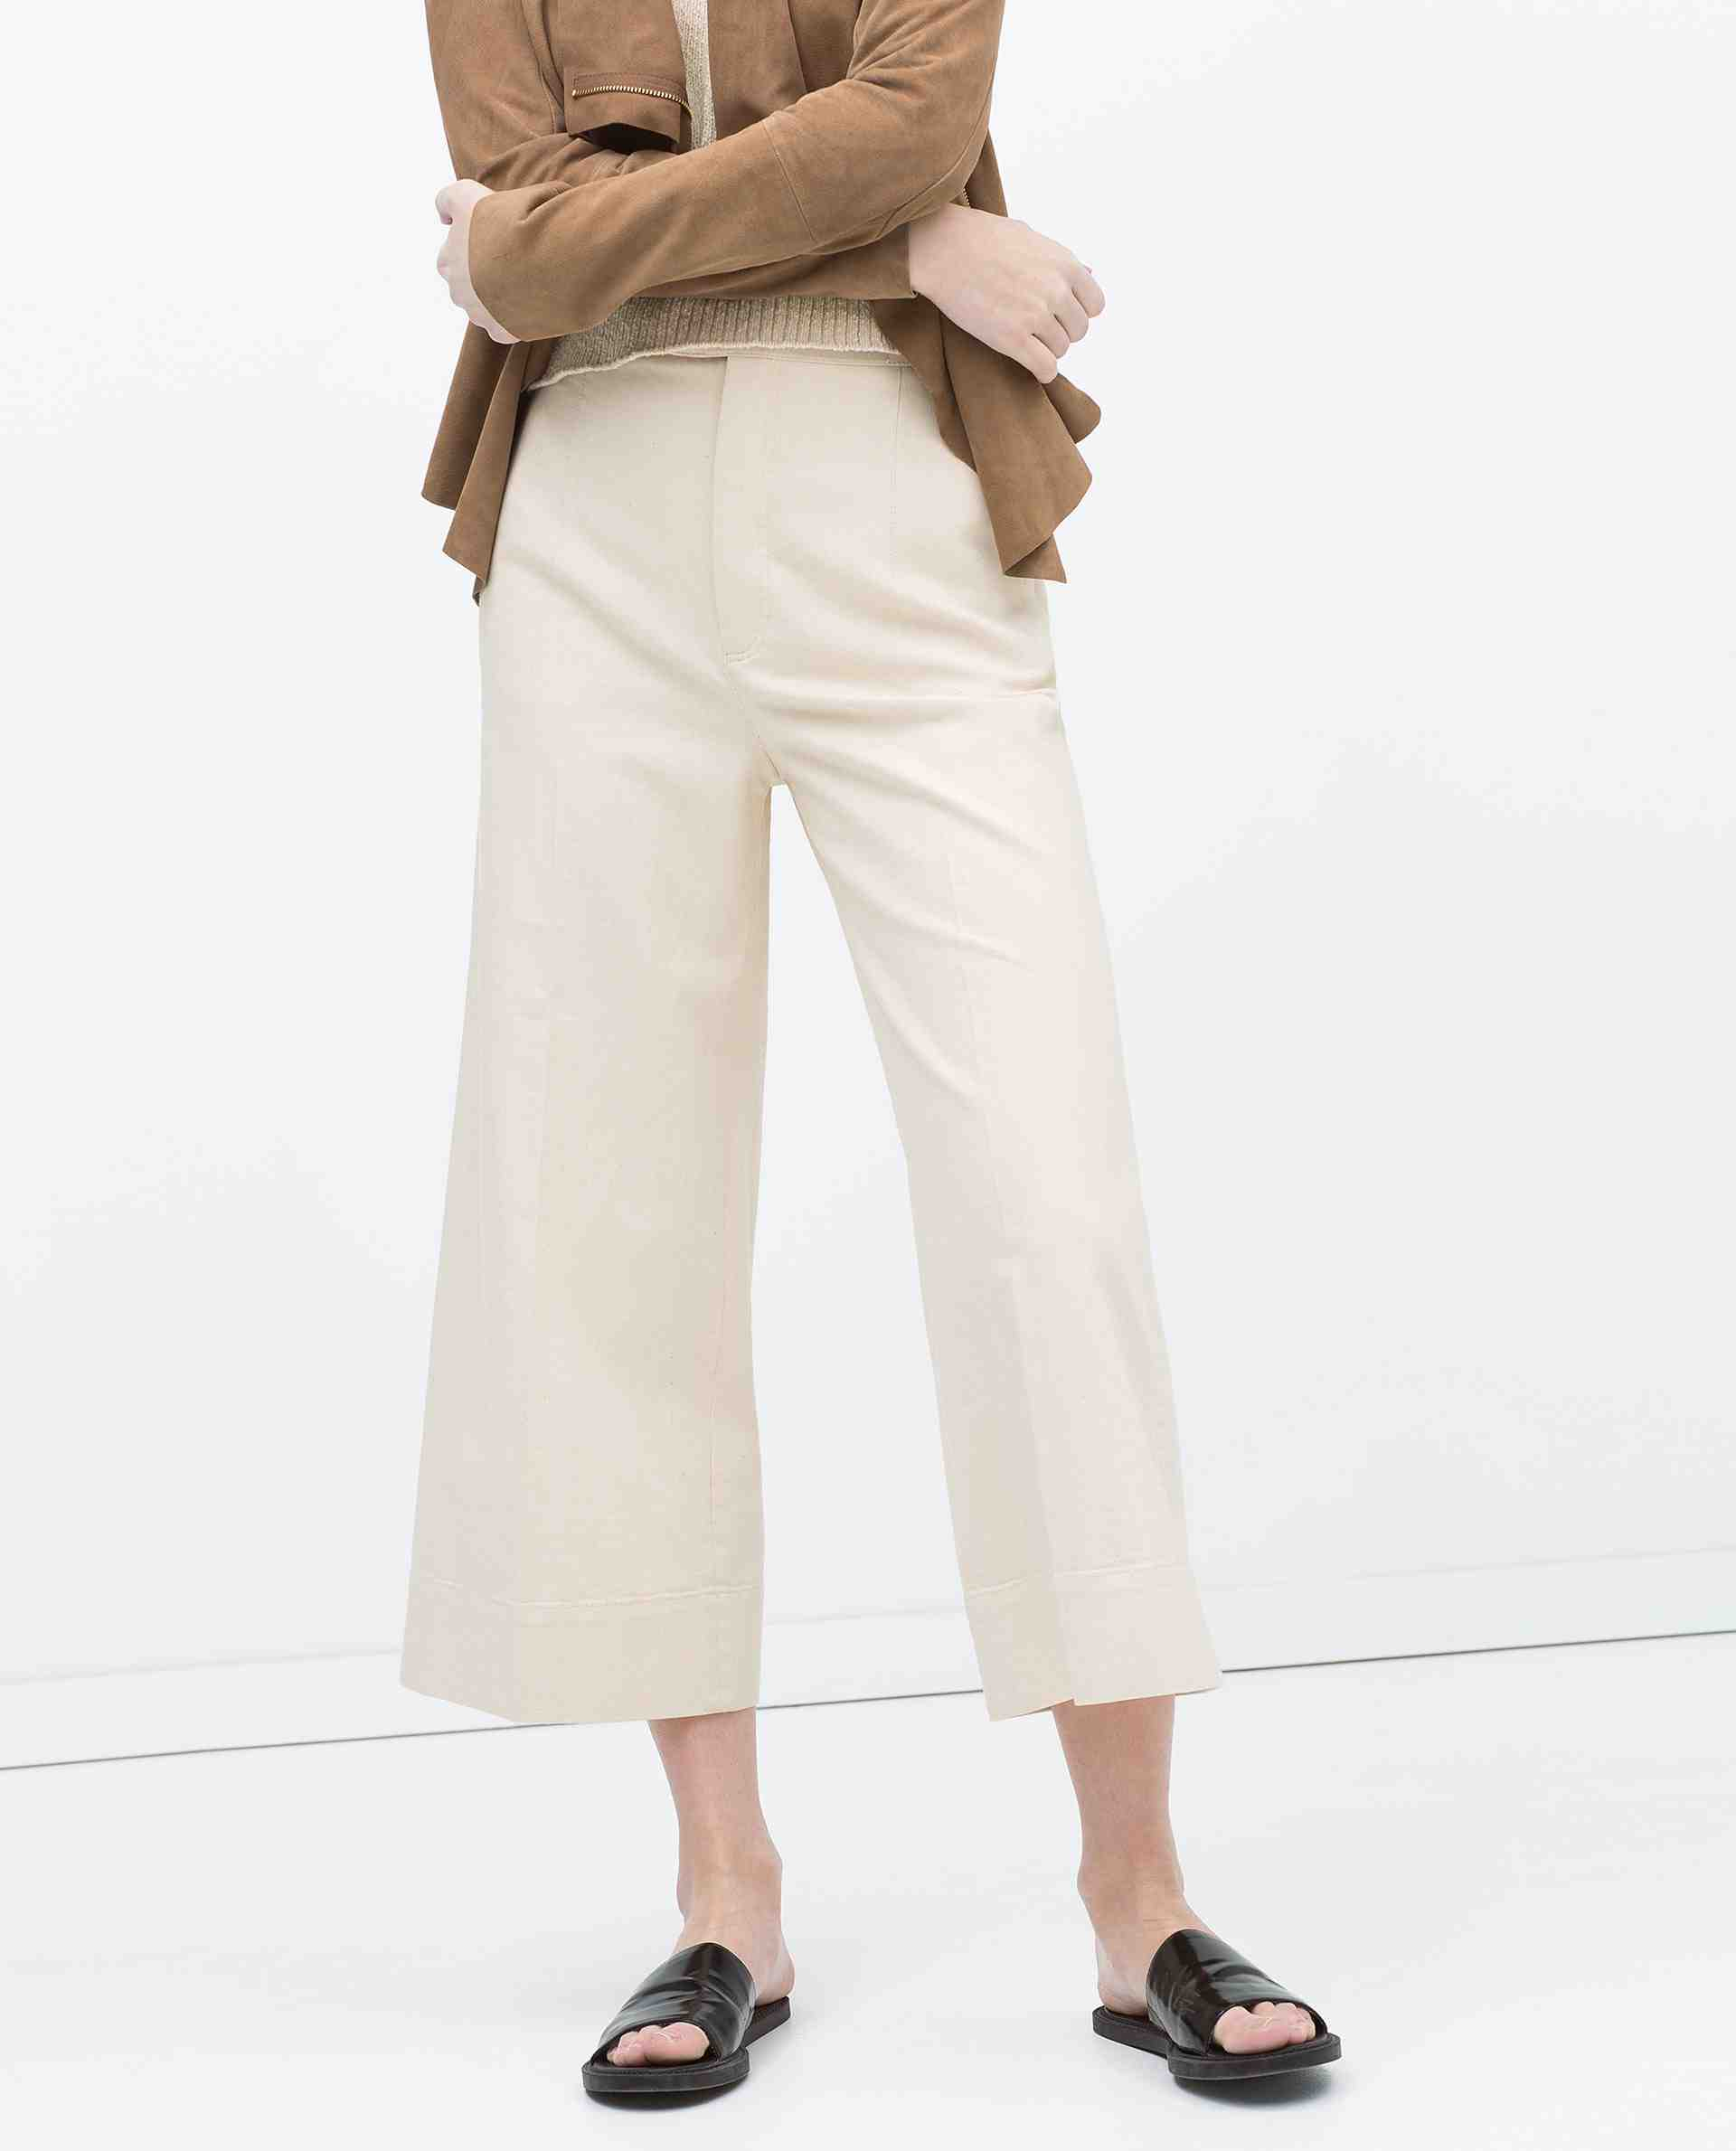 Zara - Pantalon(50 €)